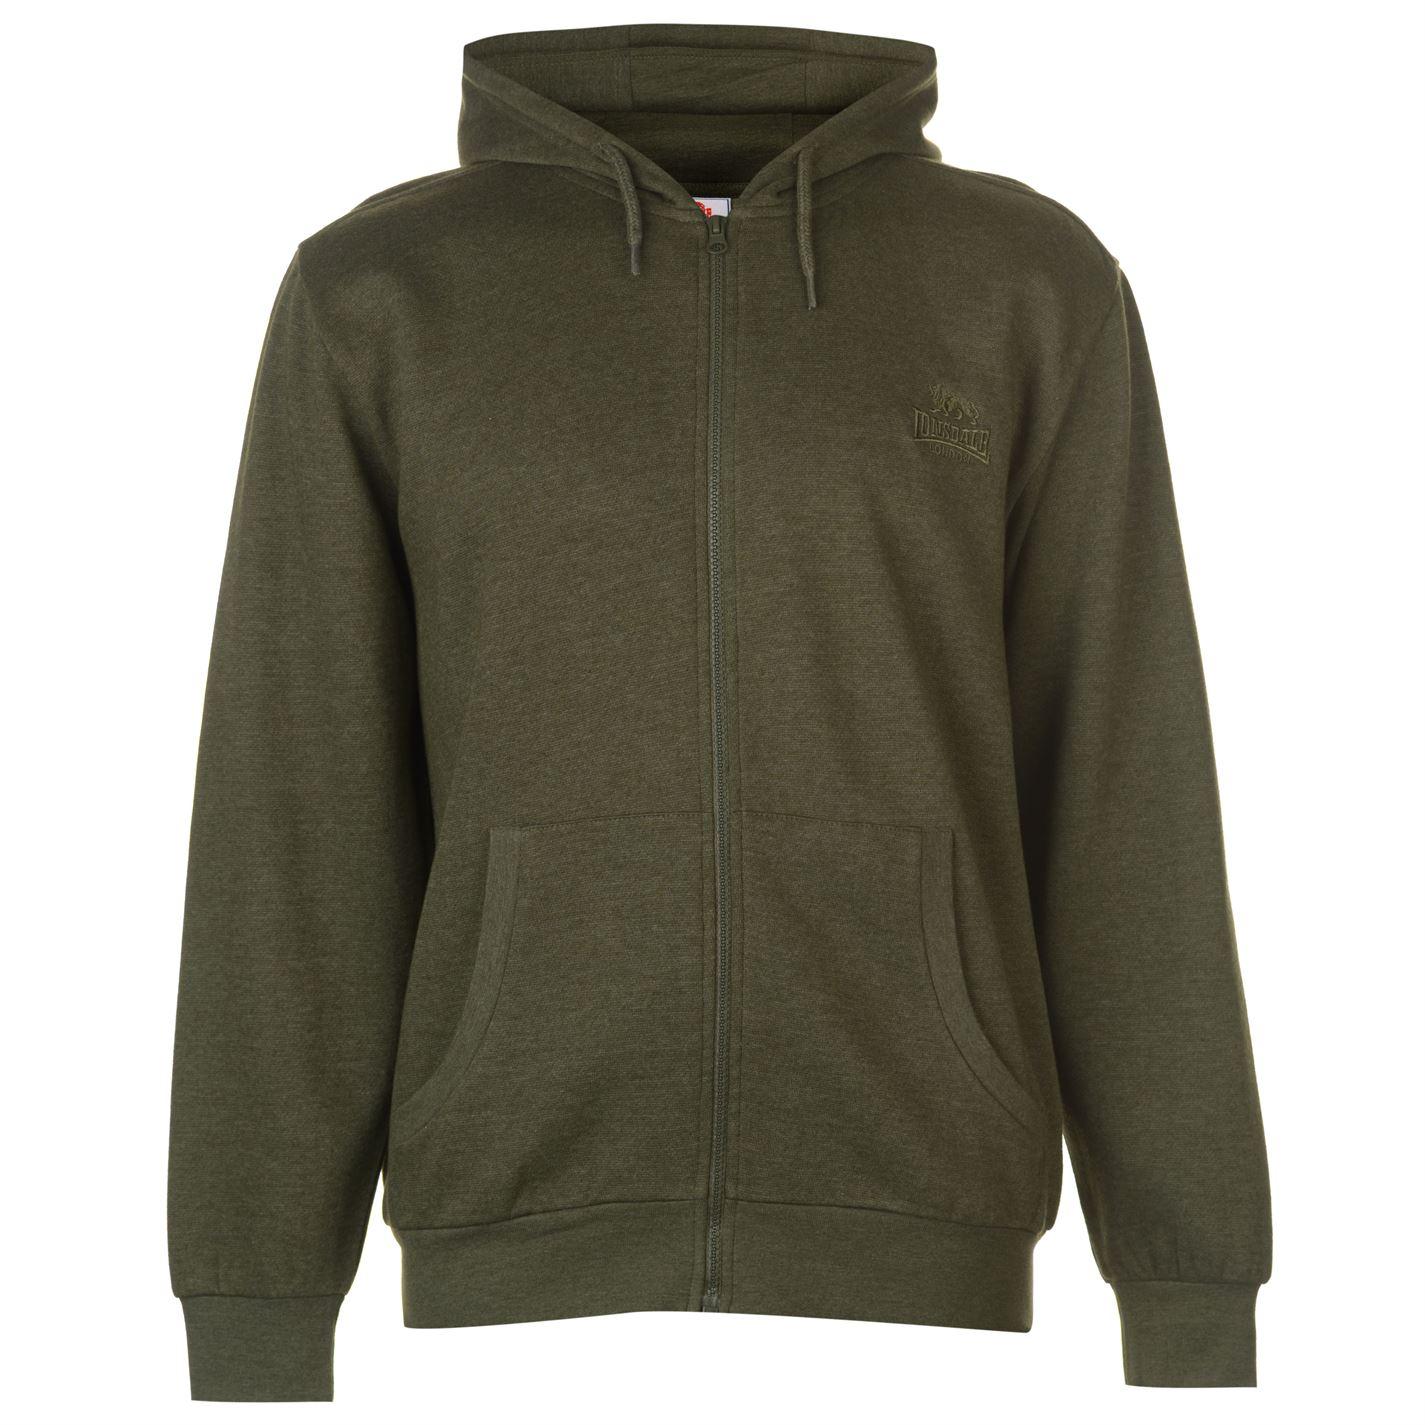 2dbd44afc870 Adidas fleece zip hood levně